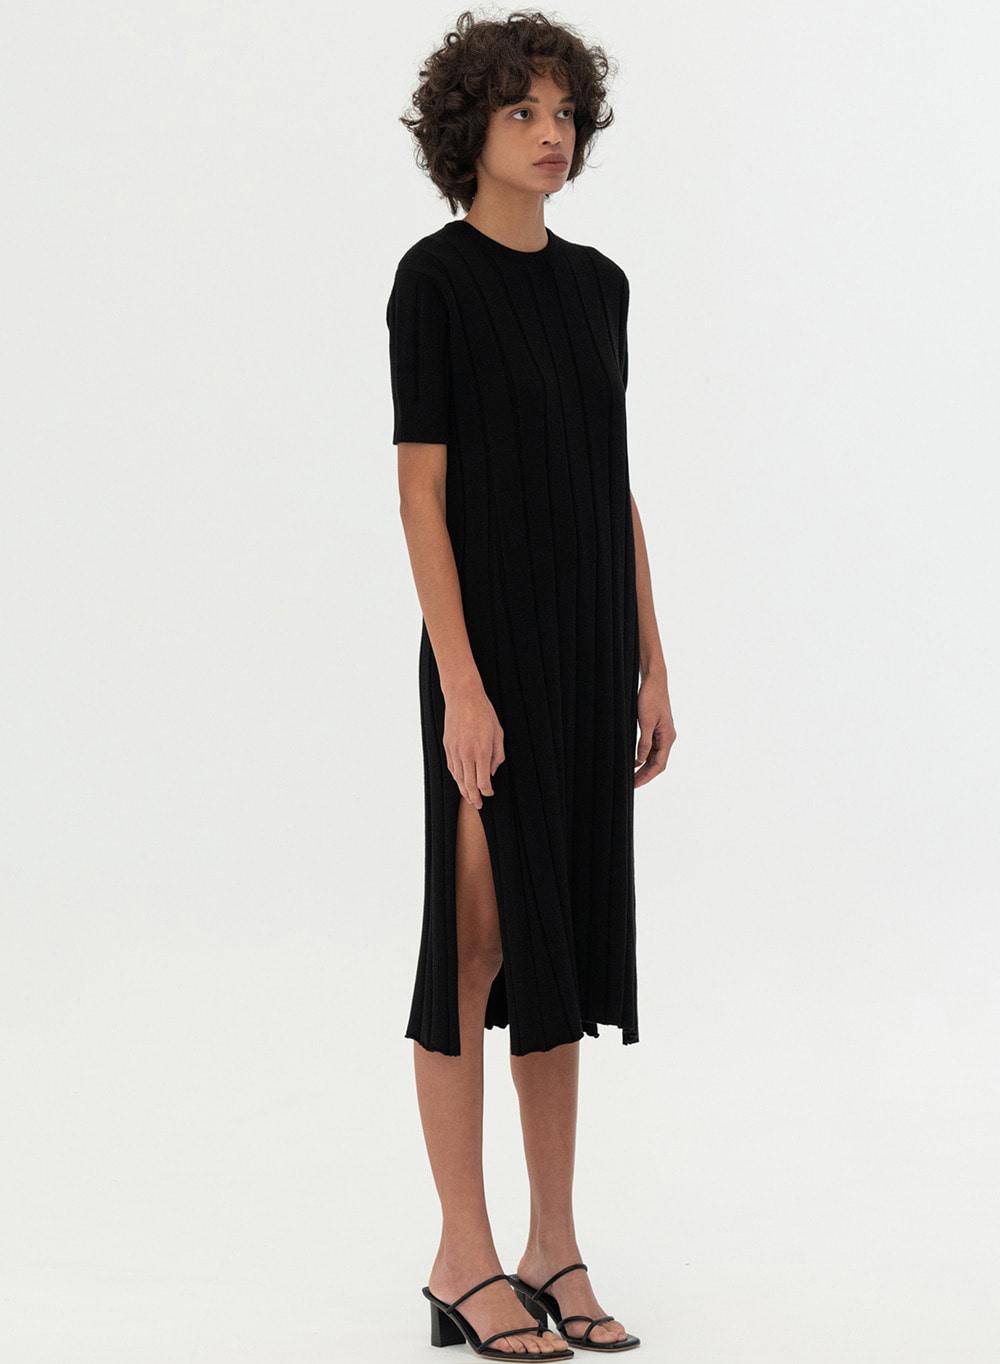 [ESSENTIAL] Bold Ribbed Knit Dress Black